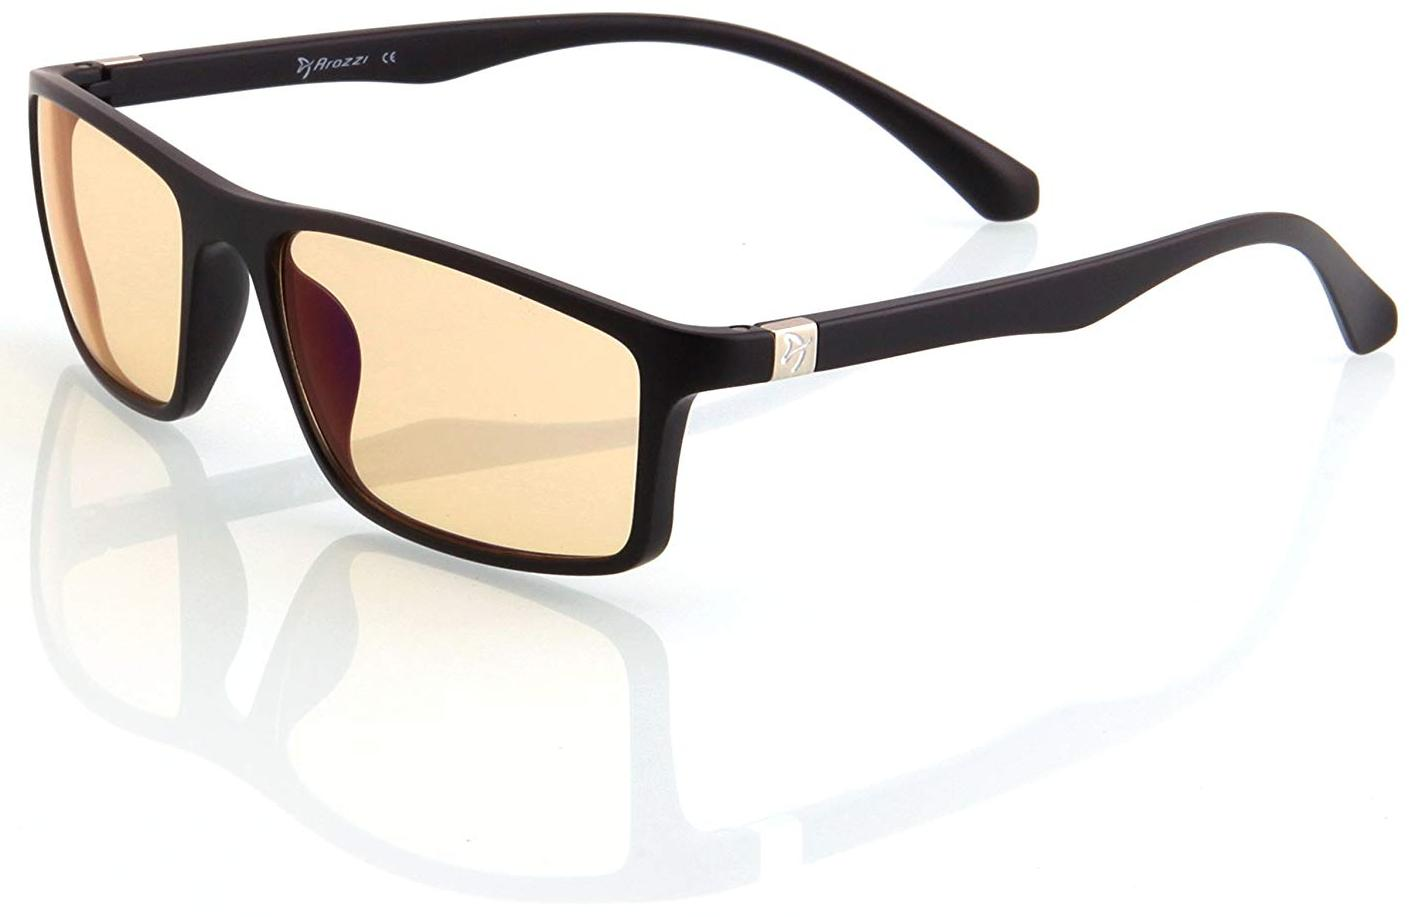 Очки для компьютера Arozzi Visione VX-200 (Black)